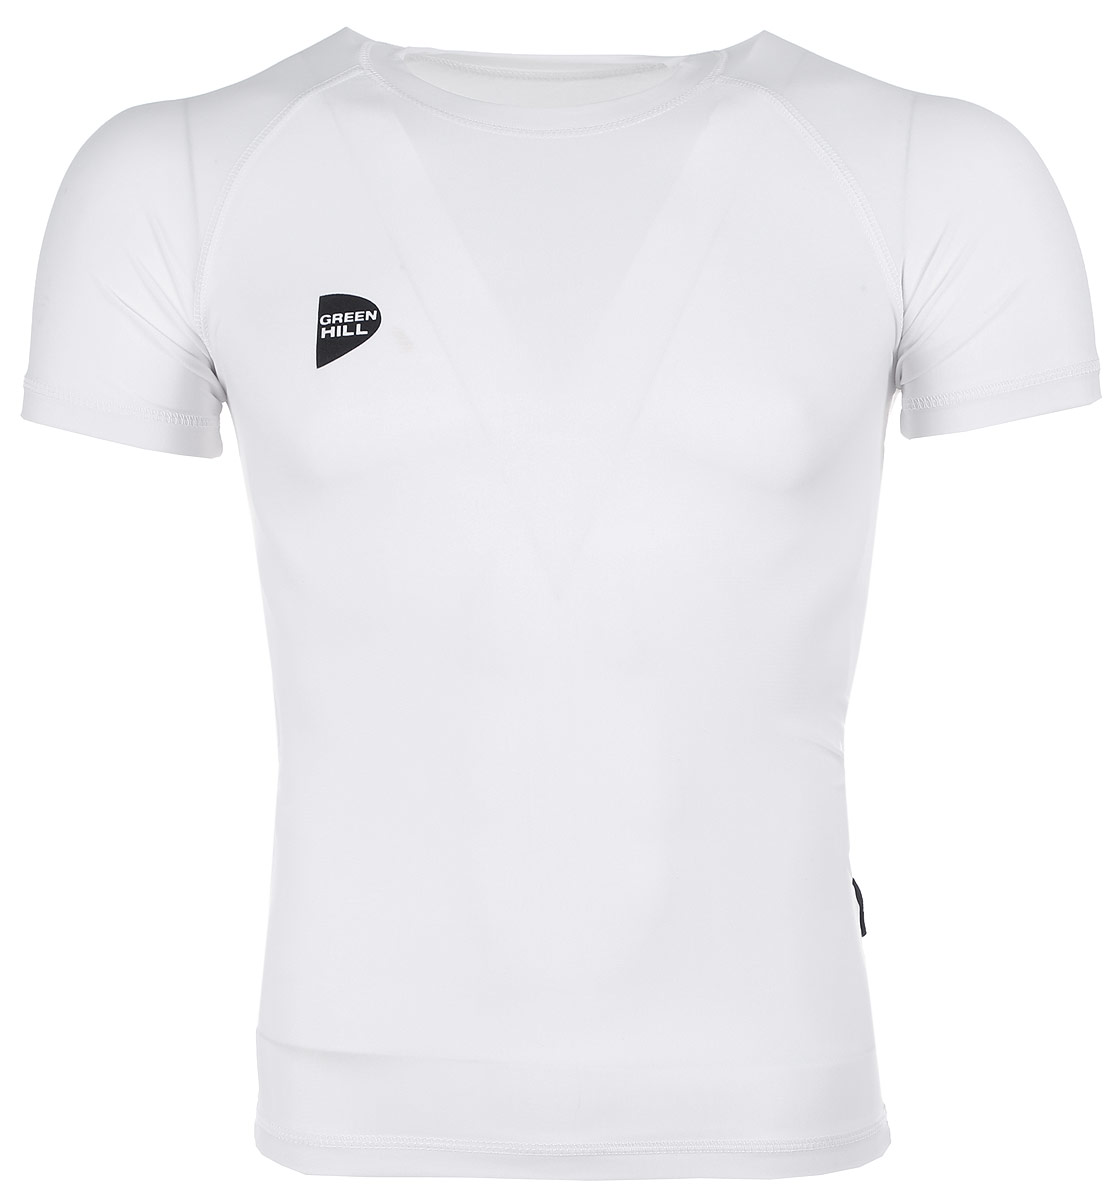 Защитная футболка Green Hill, цвет: белый. Размер XXS. RGS-3558AP-0047Защитная футболка с логотипом дзюдо. Материал: полиэстер/лайкра. Размеры: Длина 60 см ширина 35 см